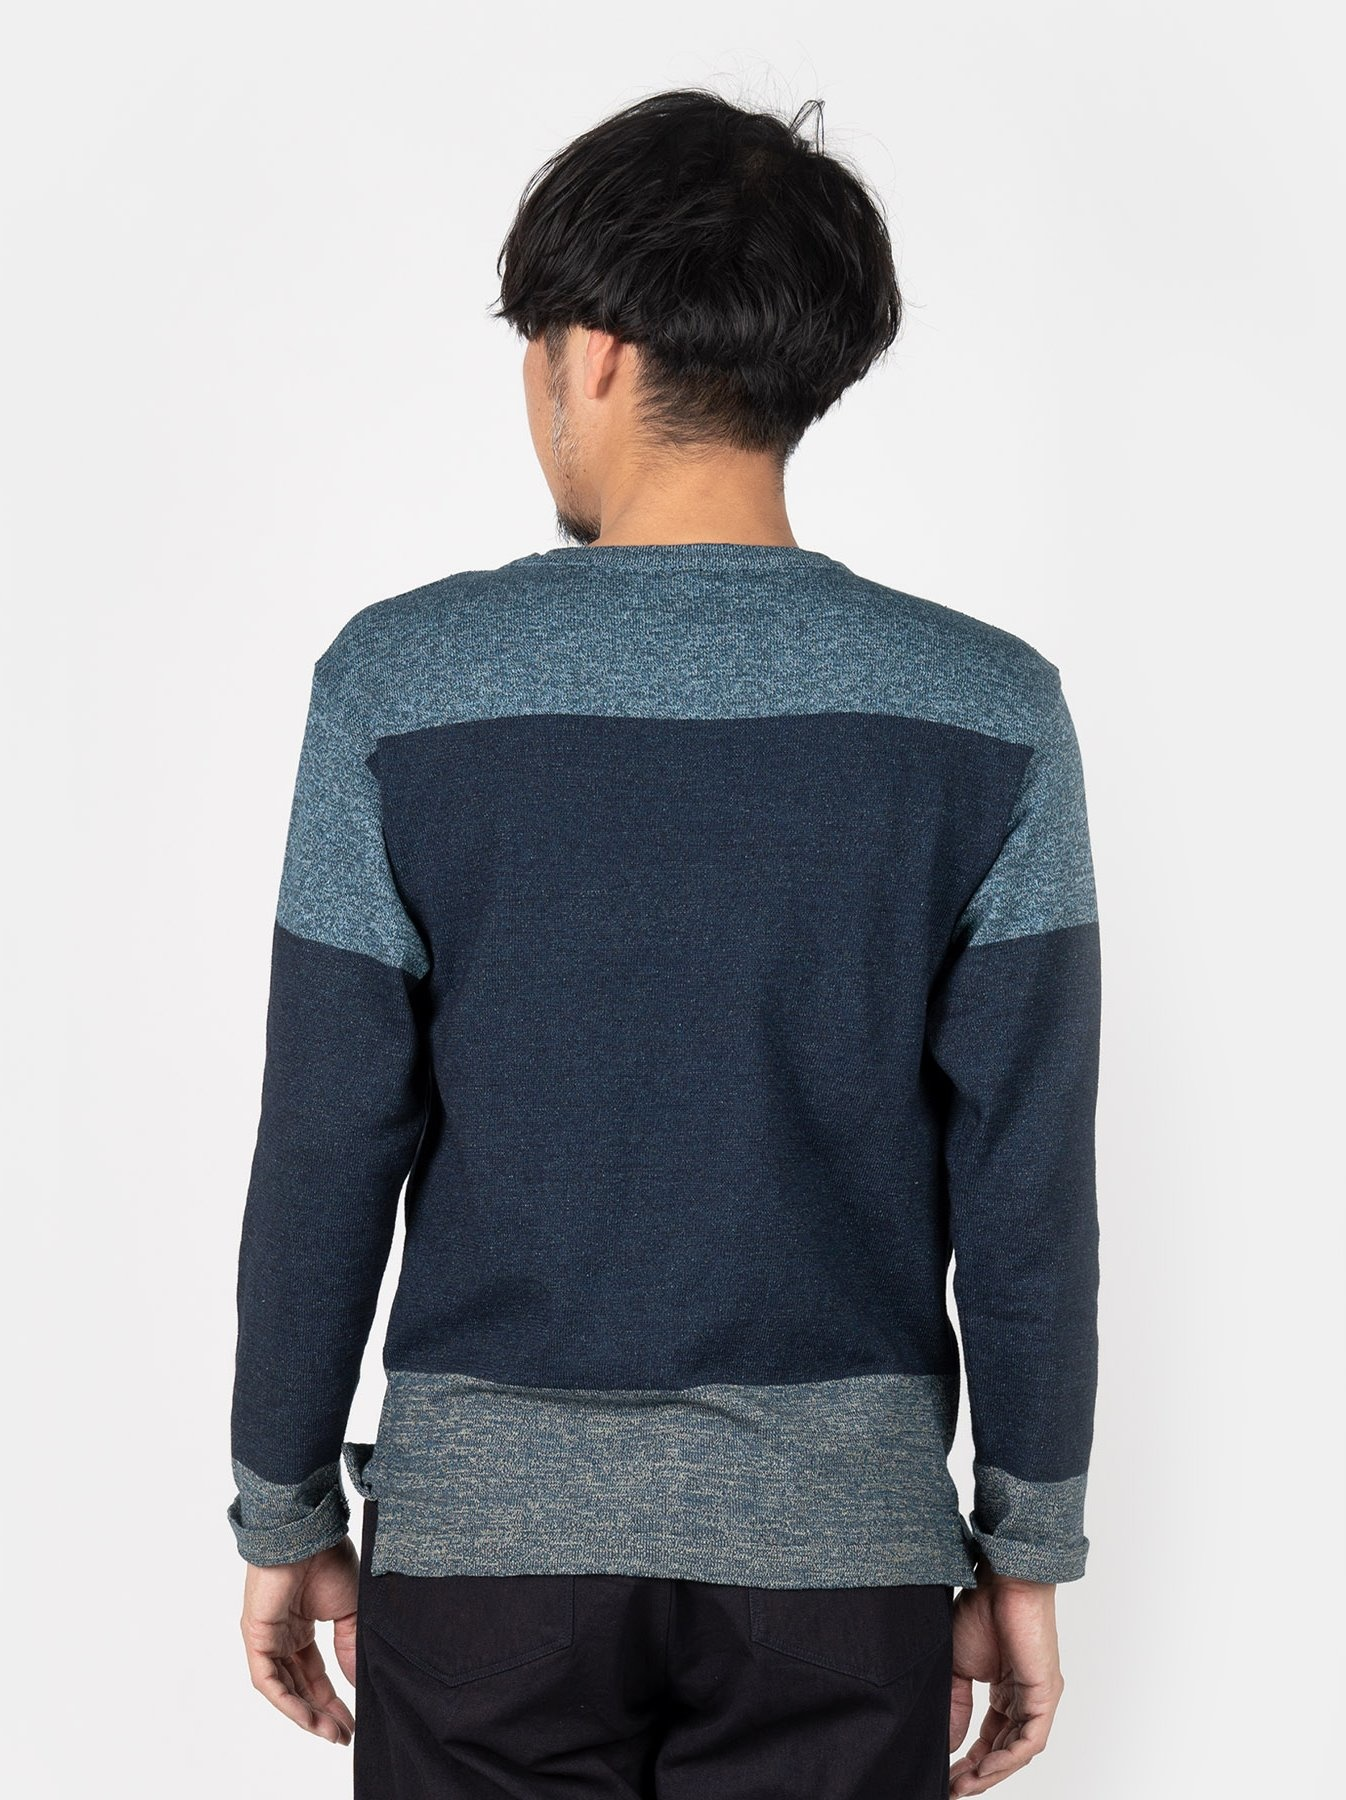 WH Gauze Basque Knit T-shirt-5